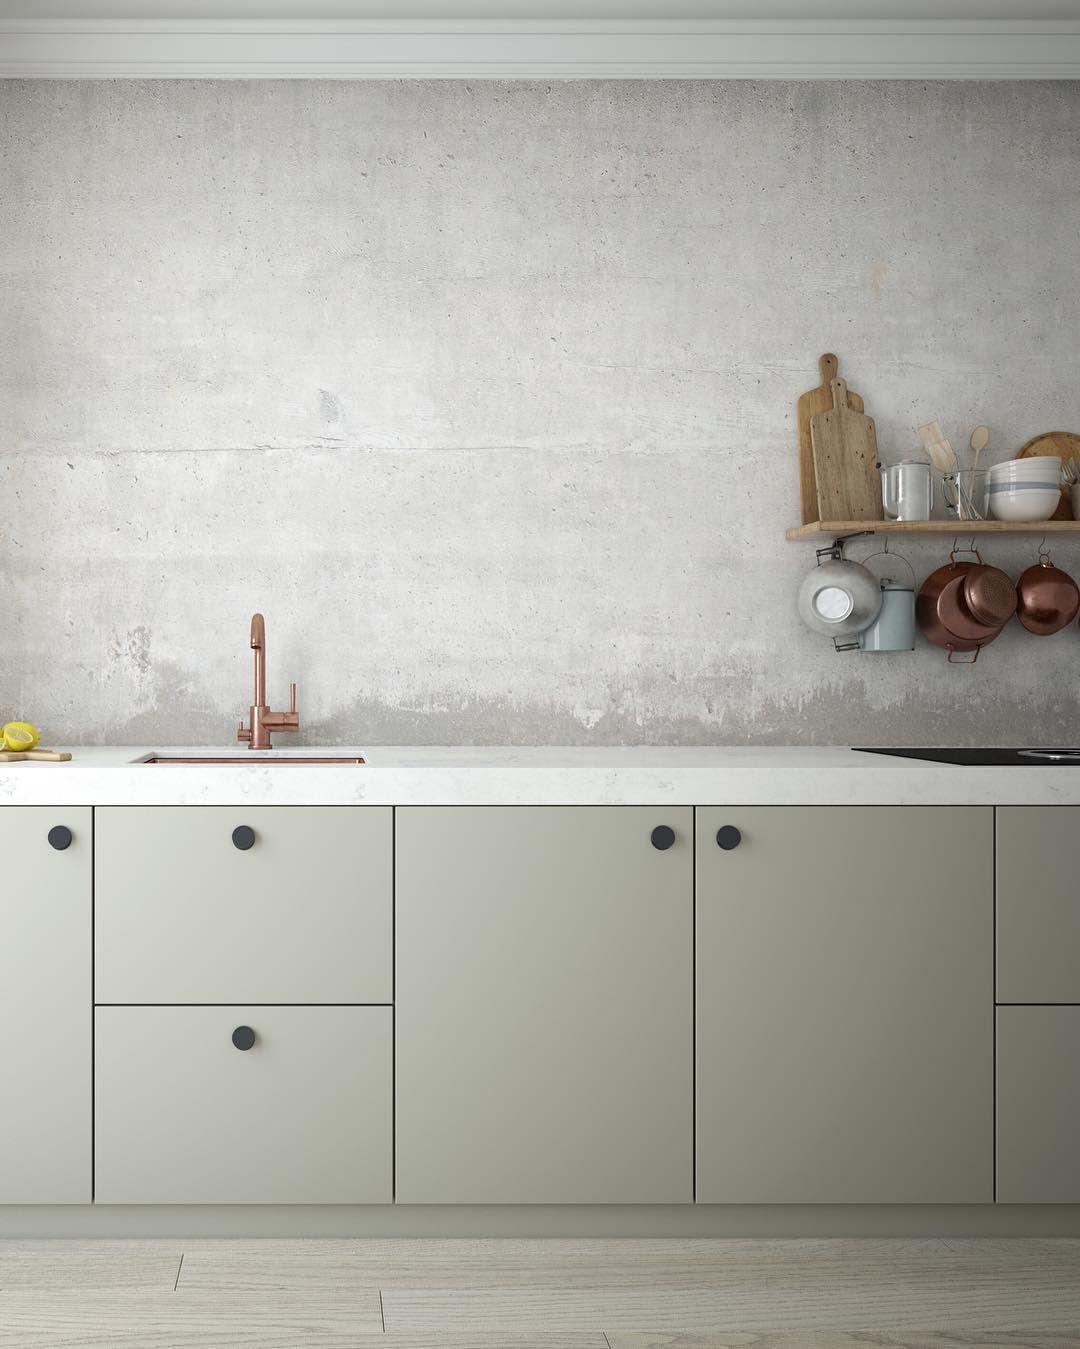 r ckwand spritzschutz k che k che beton k che. Black Bedroom Furniture Sets. Home Design Ideas